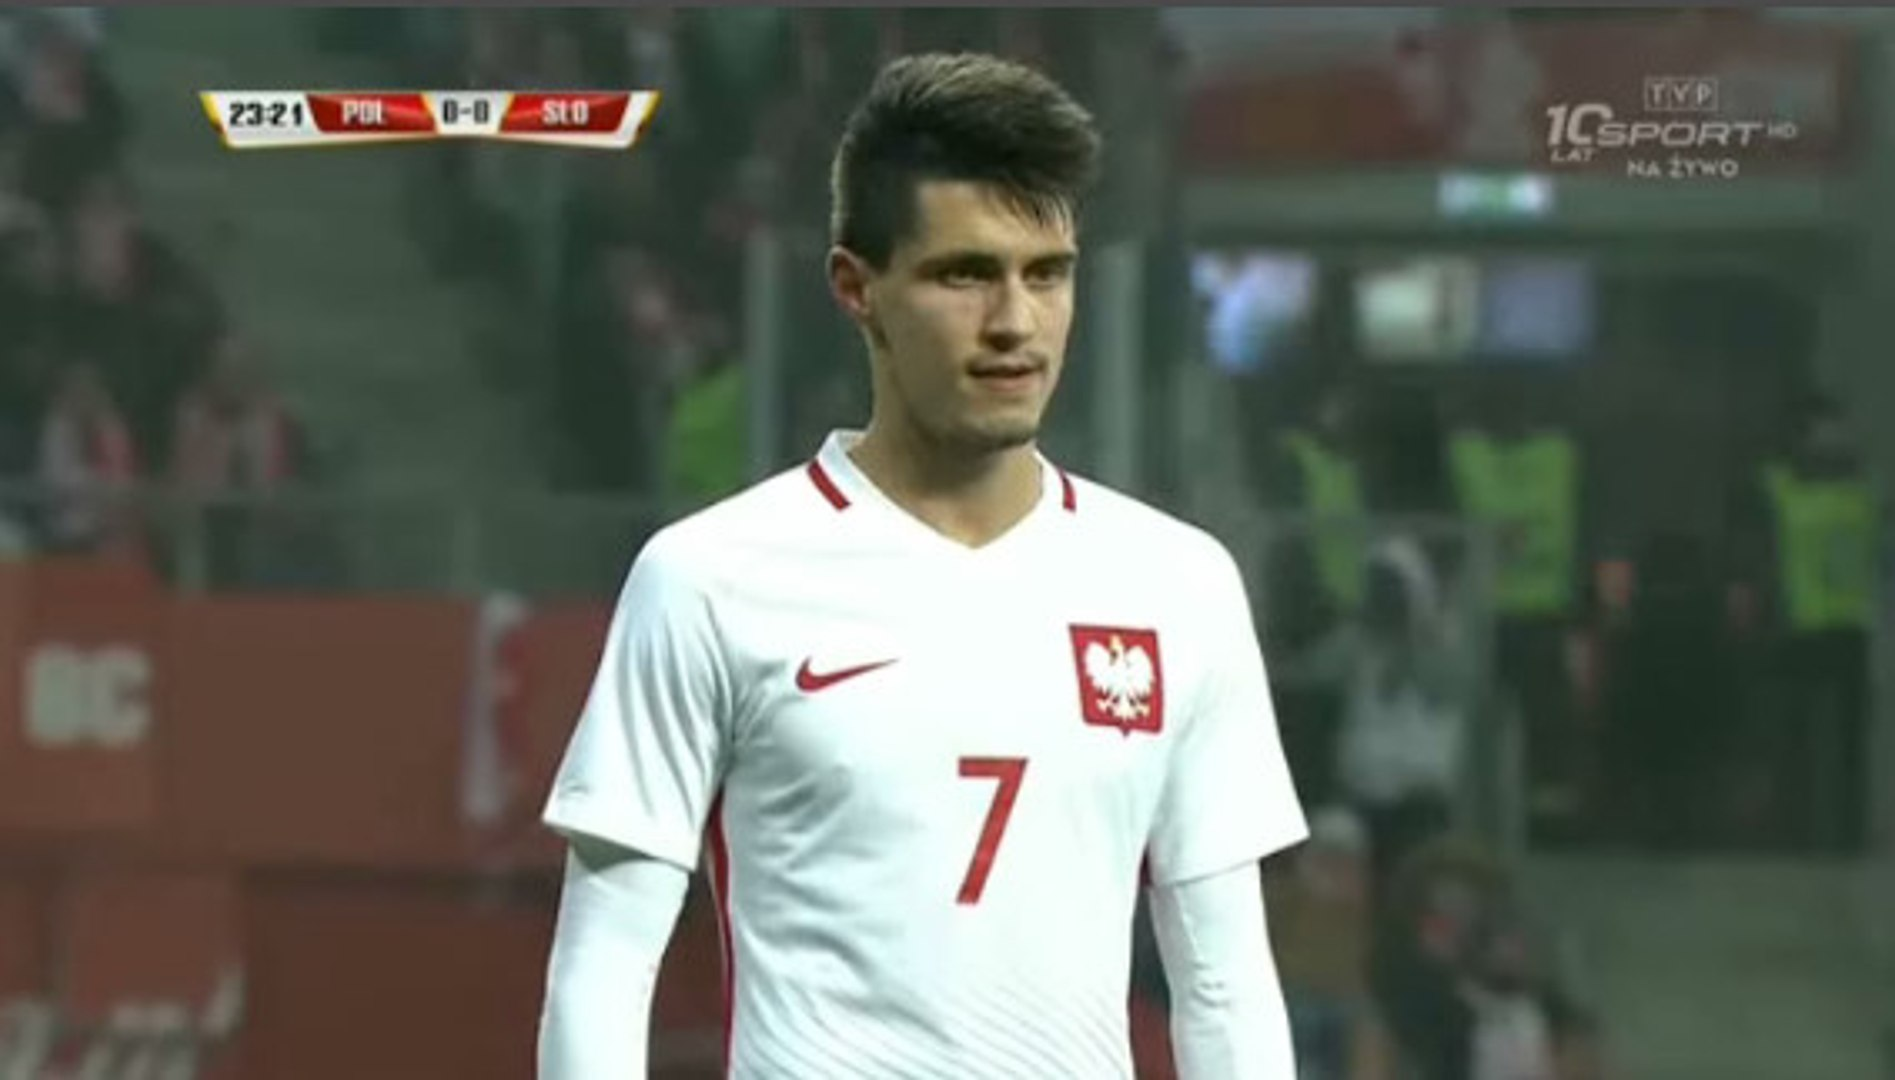 Miha Mevlja Goal - Poland 0-1 Slovenia - (14/11/2016) / FRIENDLY MATCH